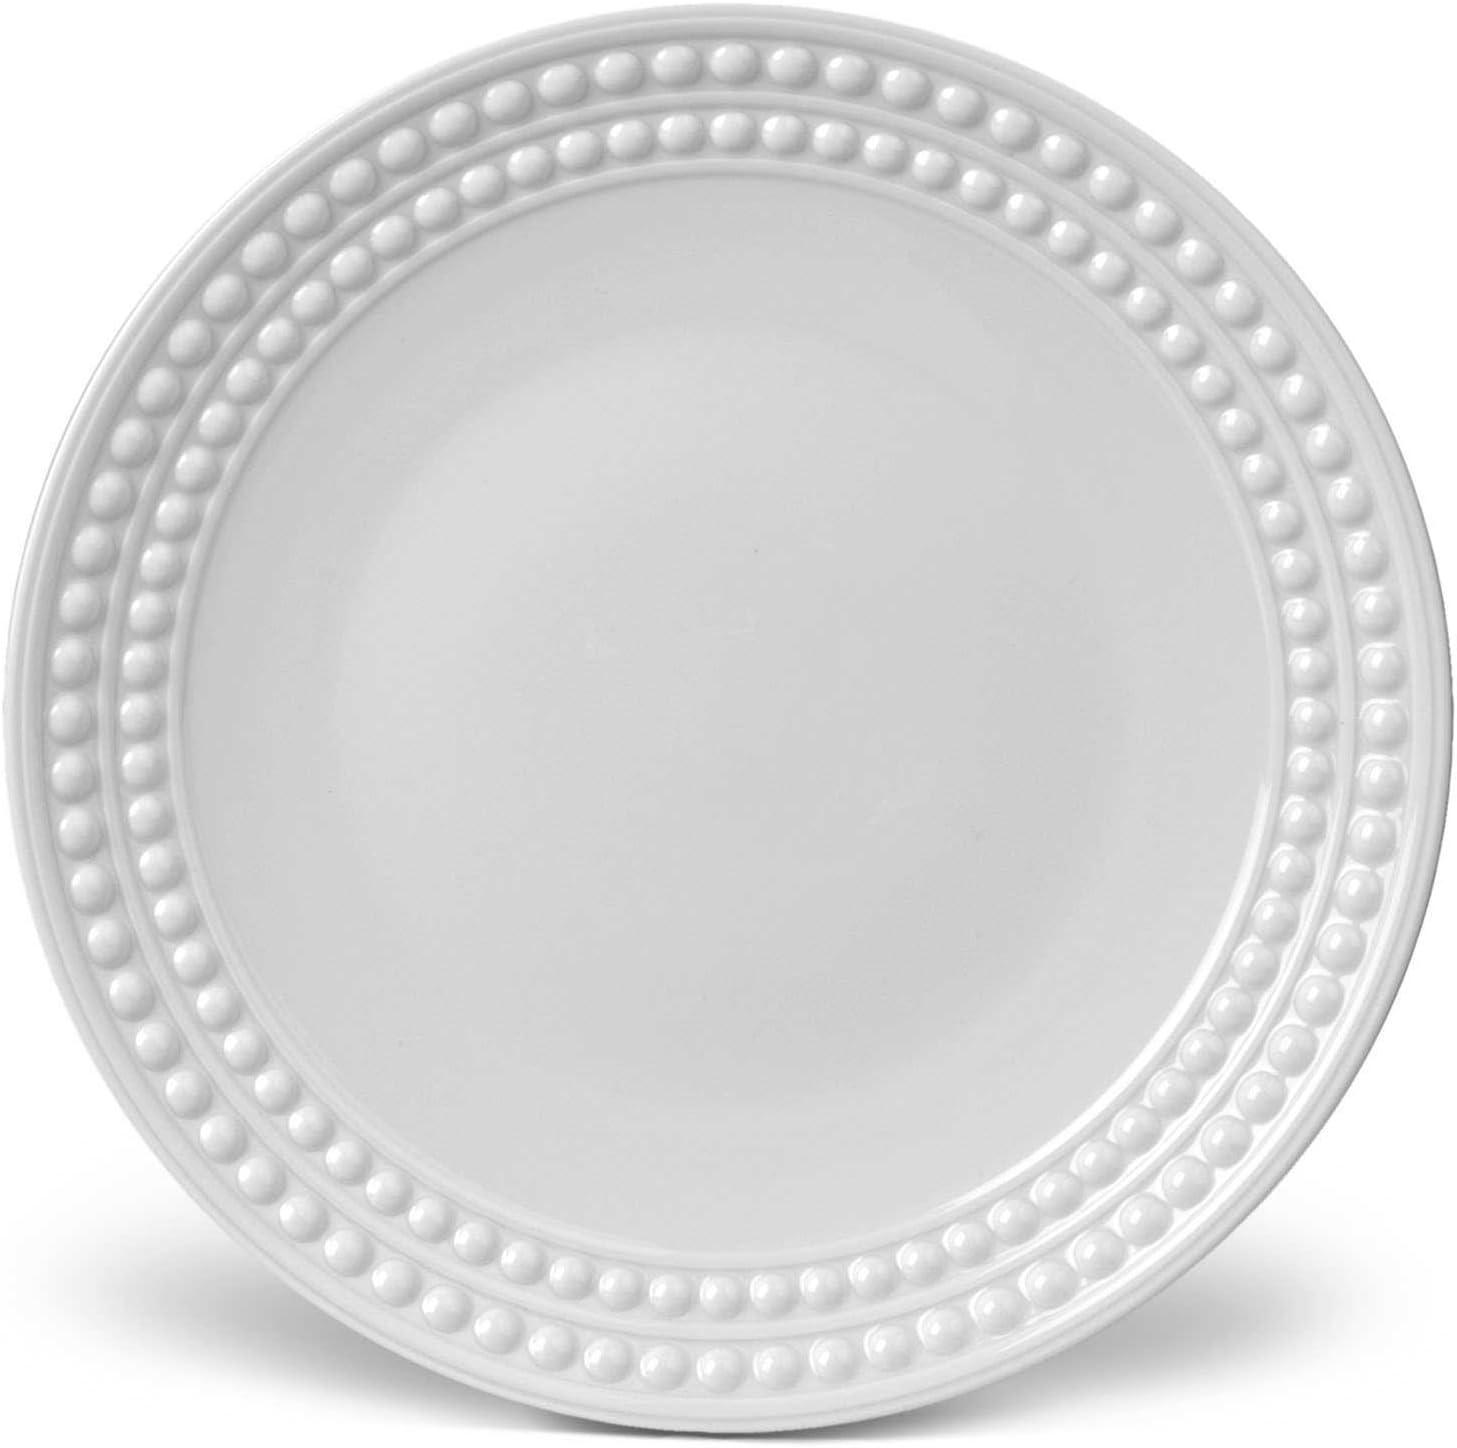 L'Objet Perlee Max 90% OFF service White Dessert Plate 8.5in